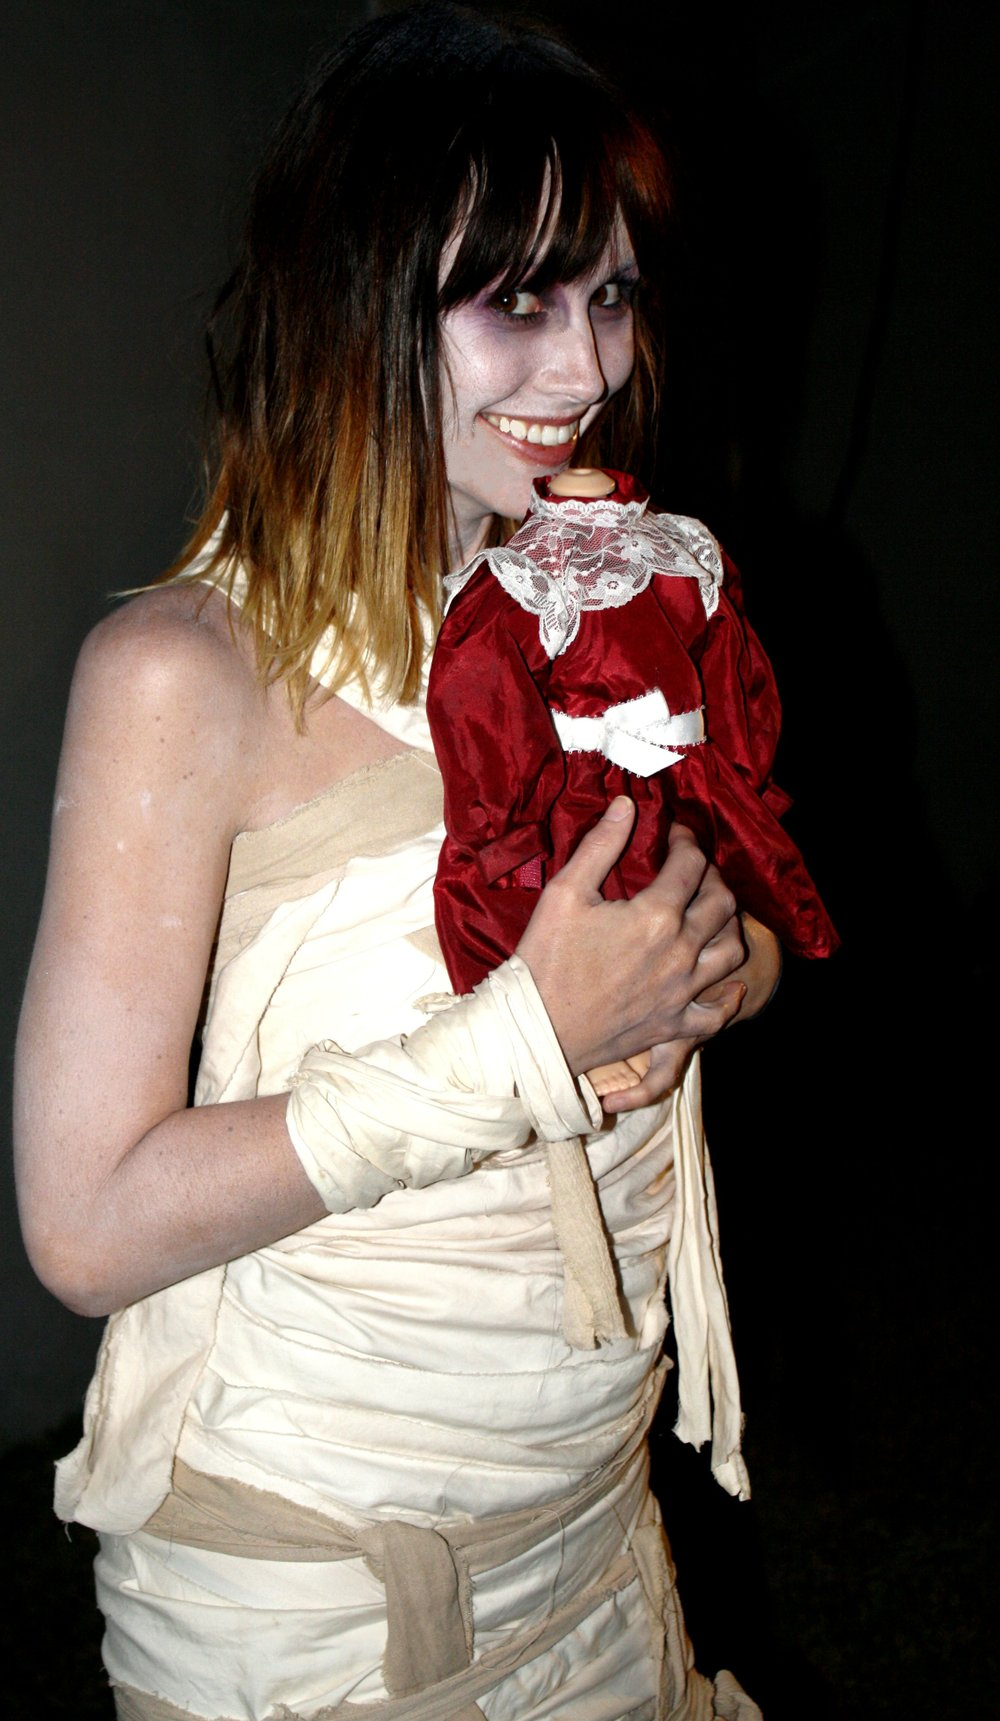 Casondra Vachon's mummy costume